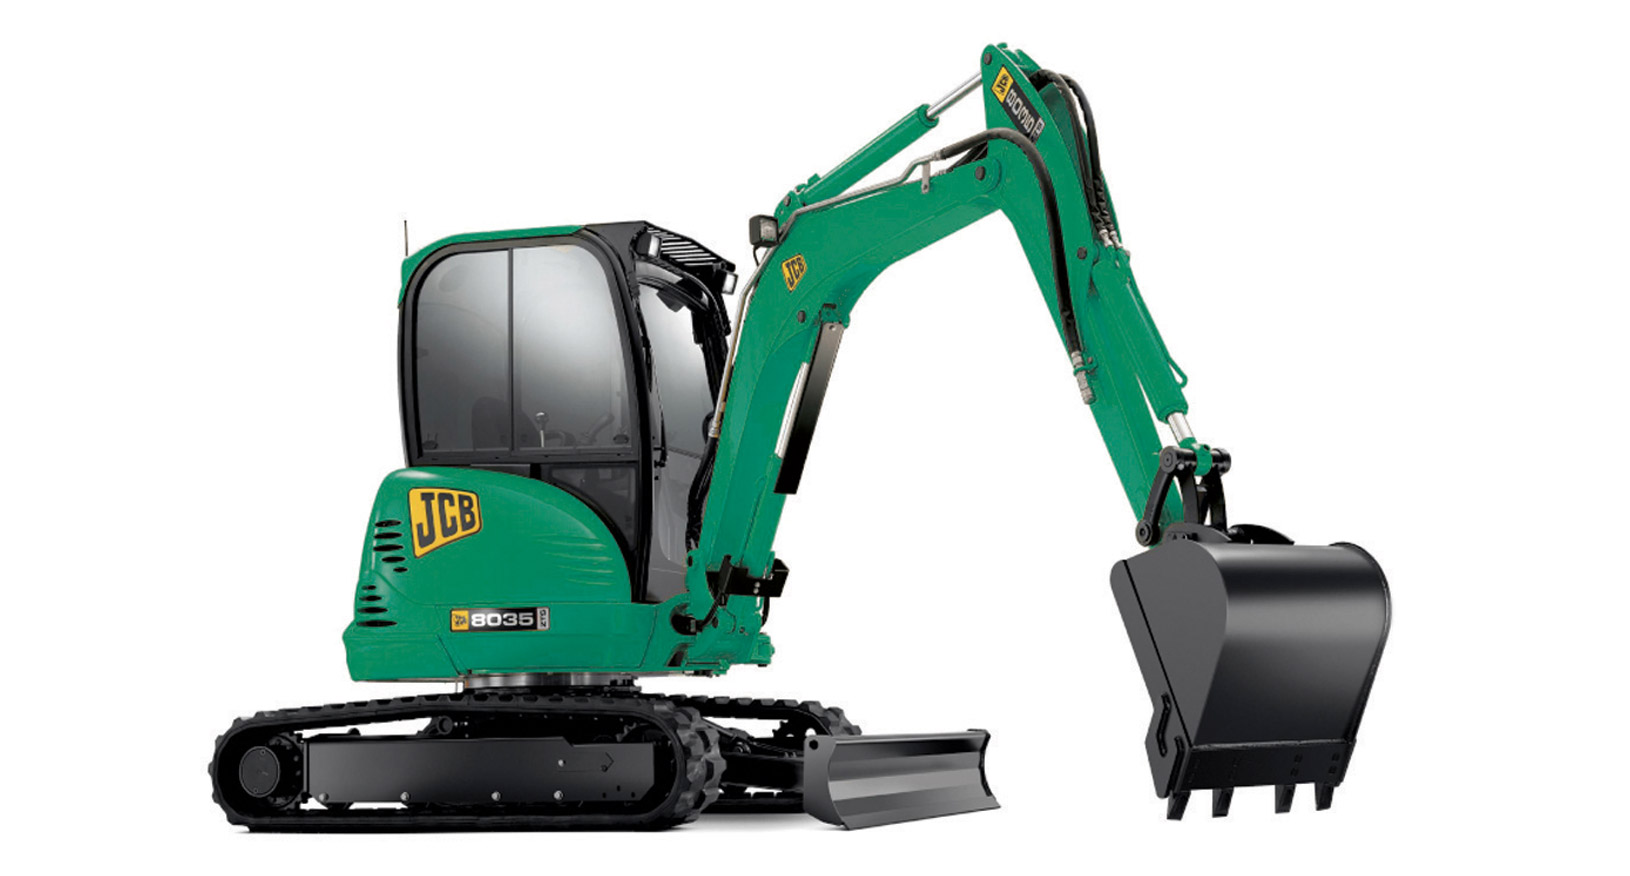 4.5T Tracked Excavator